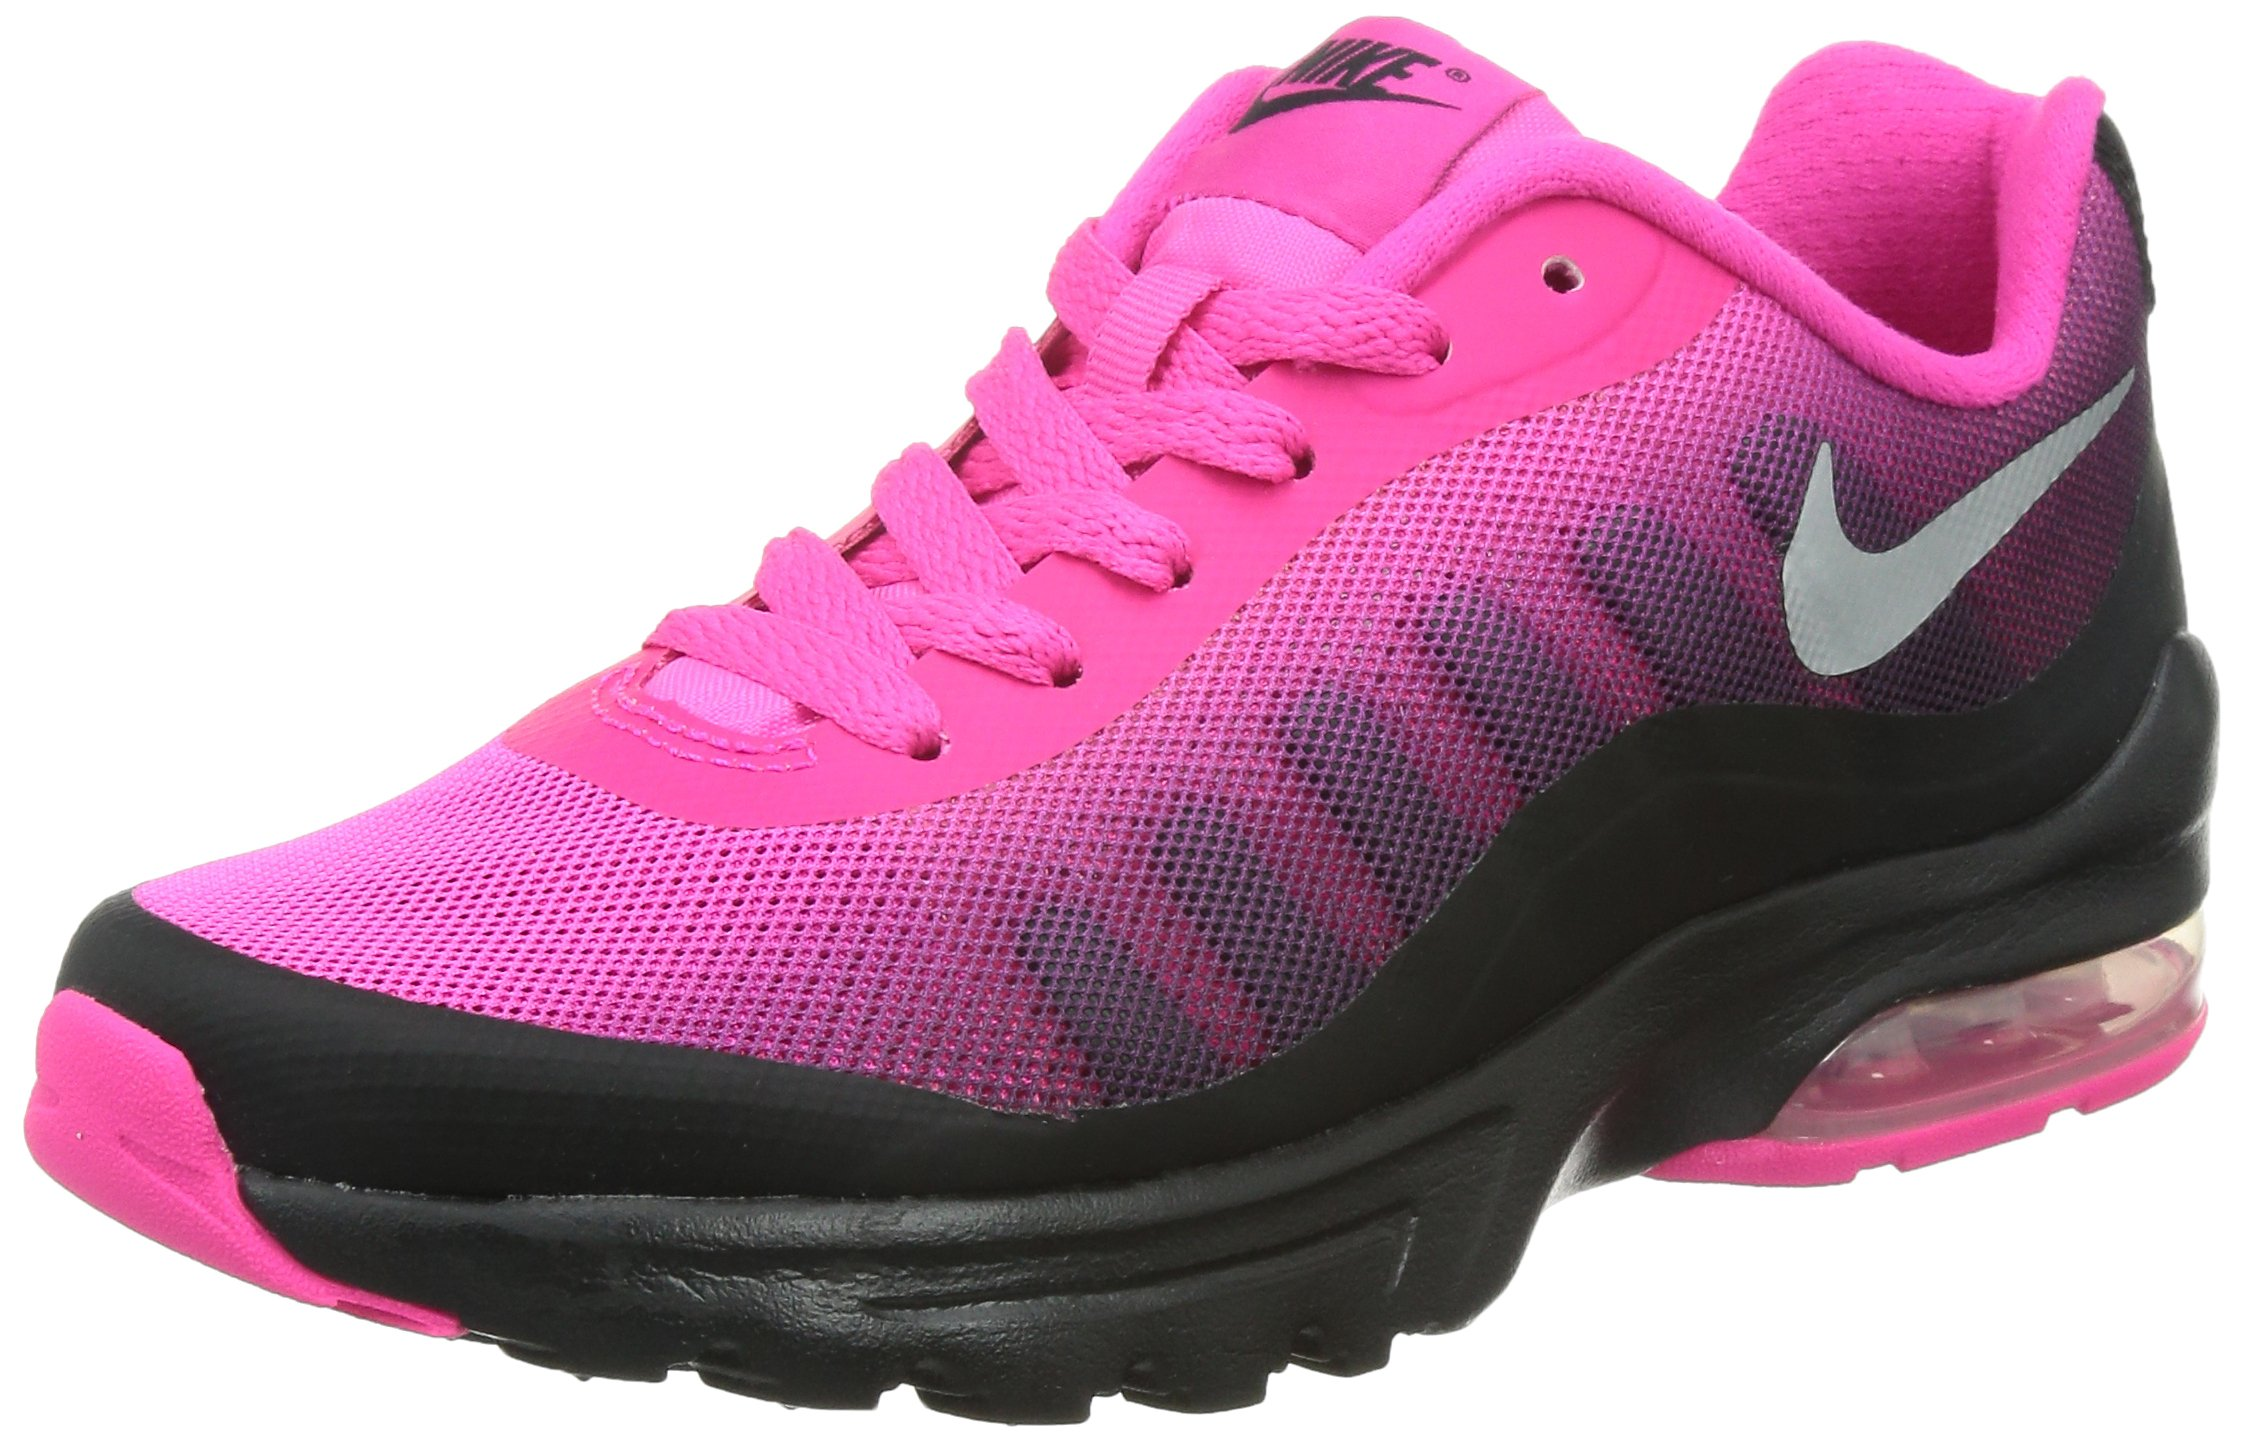 Nike Women's Air Max Invigor Print Black/Metallic Silver/Pink Fl/SPRT Fc Running Shoe 6 Women US